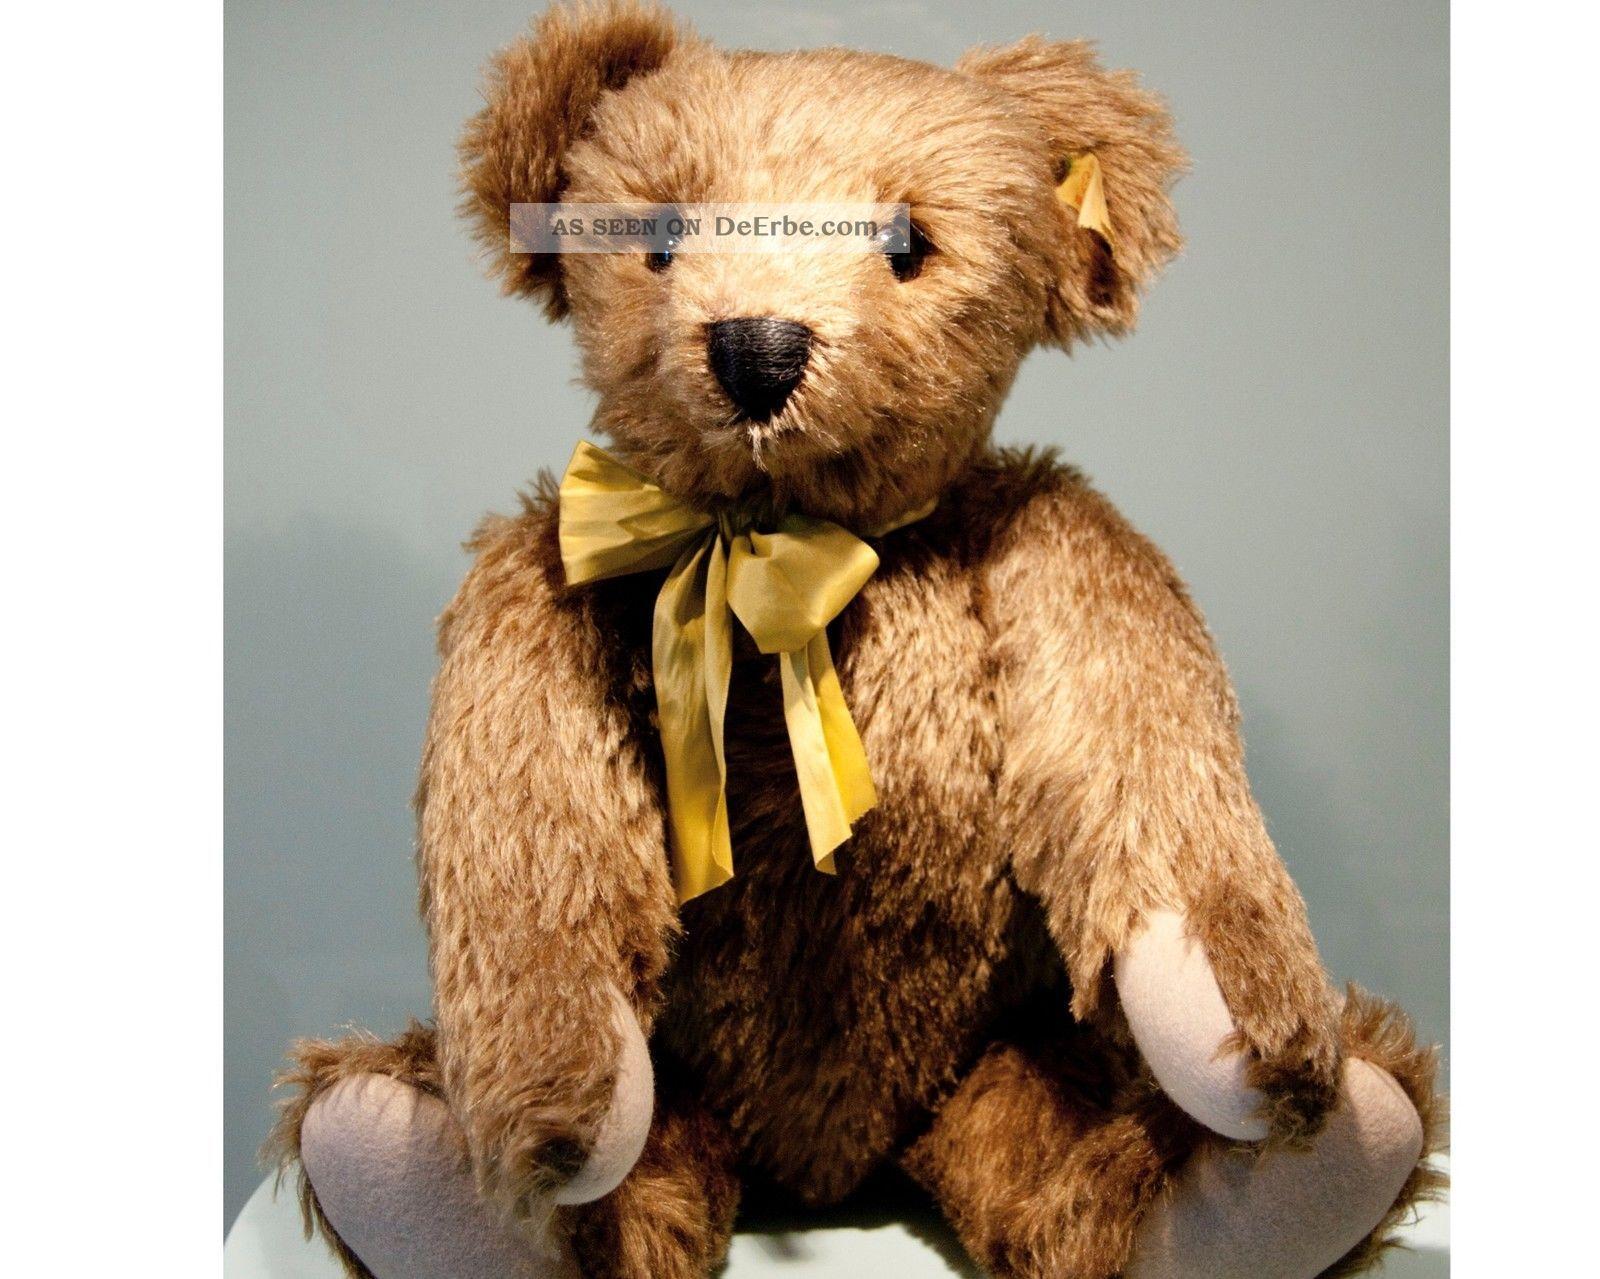 Grosser Steiff Teddy Teddybär ♥ Classic Bär 1909 Knopf Fahne Mohair Unbespielt Stofftiere & Teddybären Bild